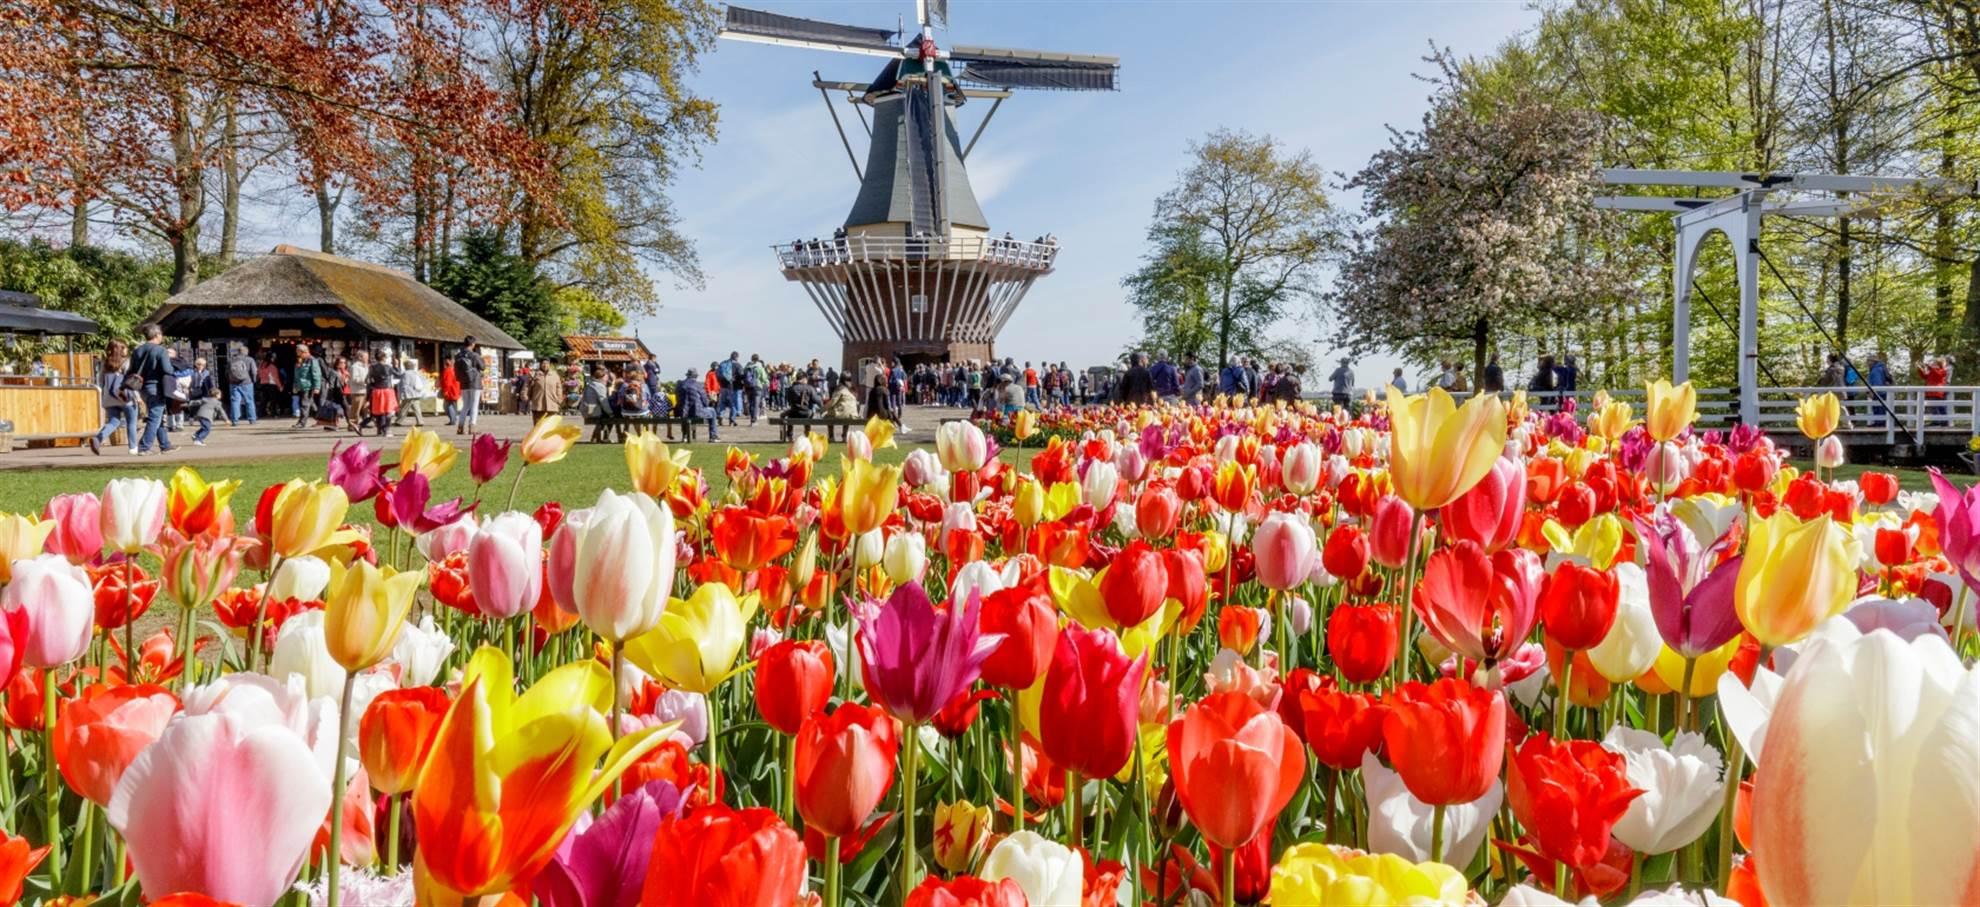 Tour to Keukenhof & Flowerfields from the Hague